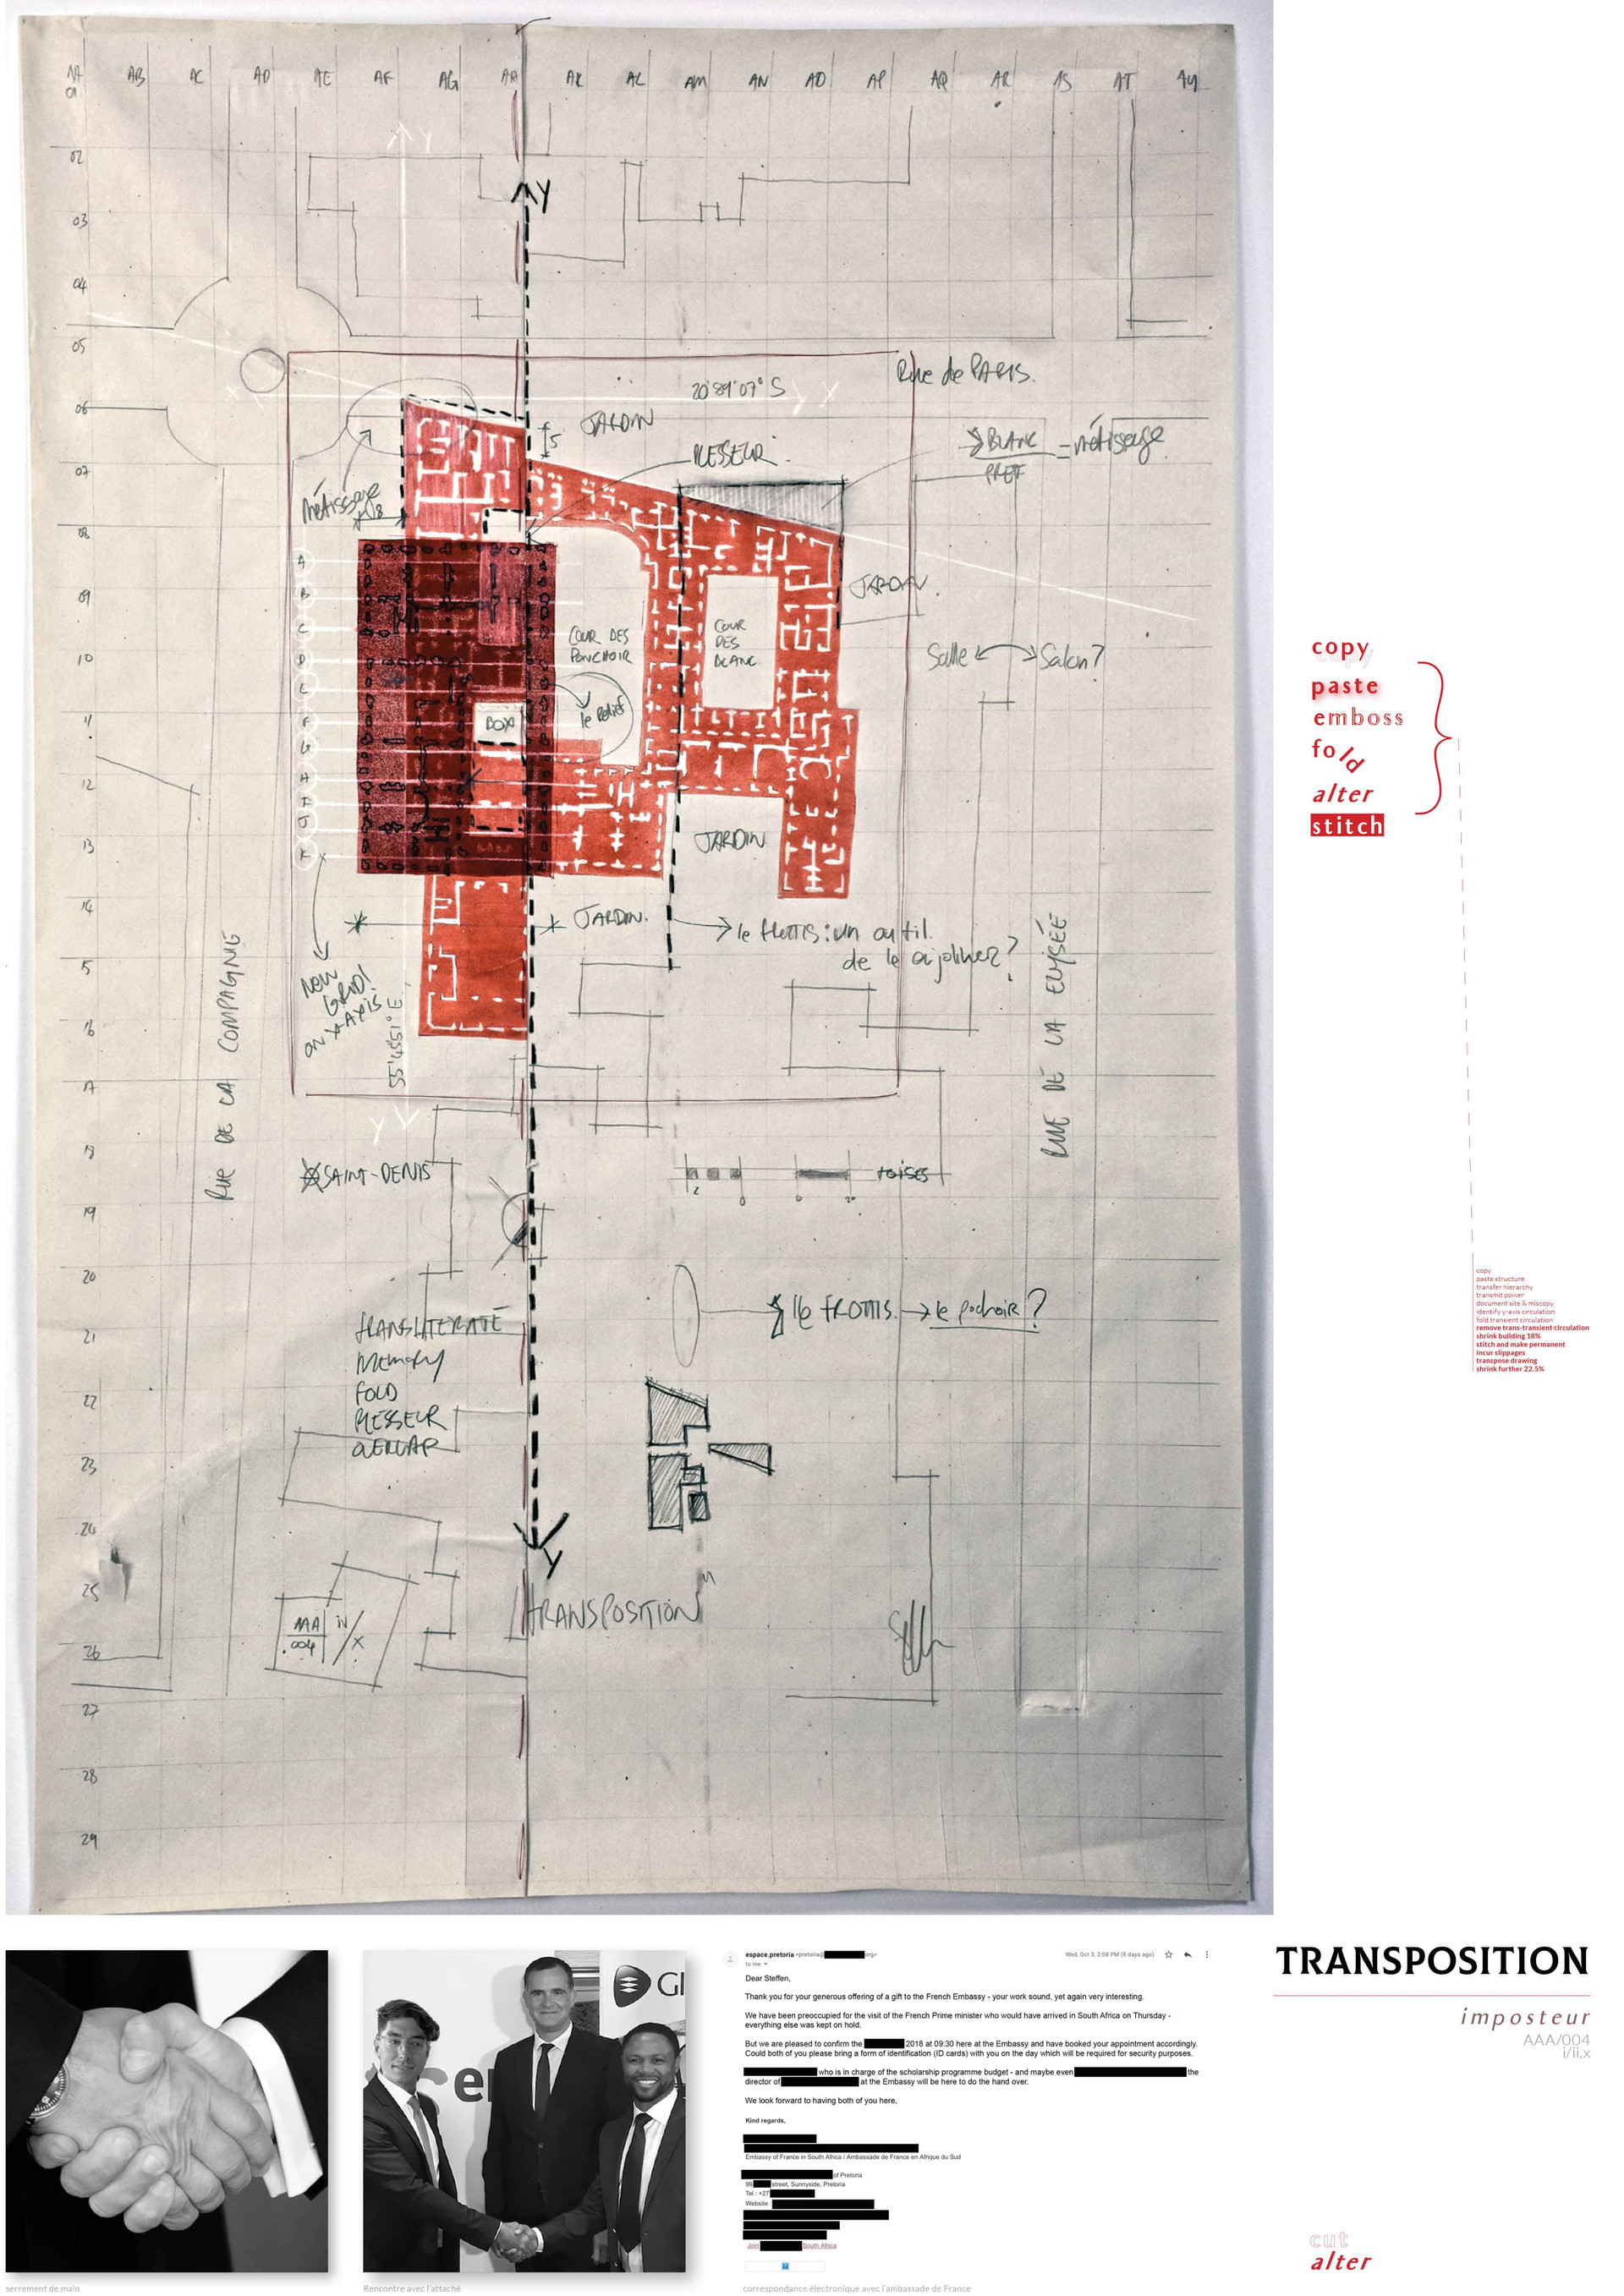 Transposition (Almanac I/II). Fischer, S. Unit 12. 2018